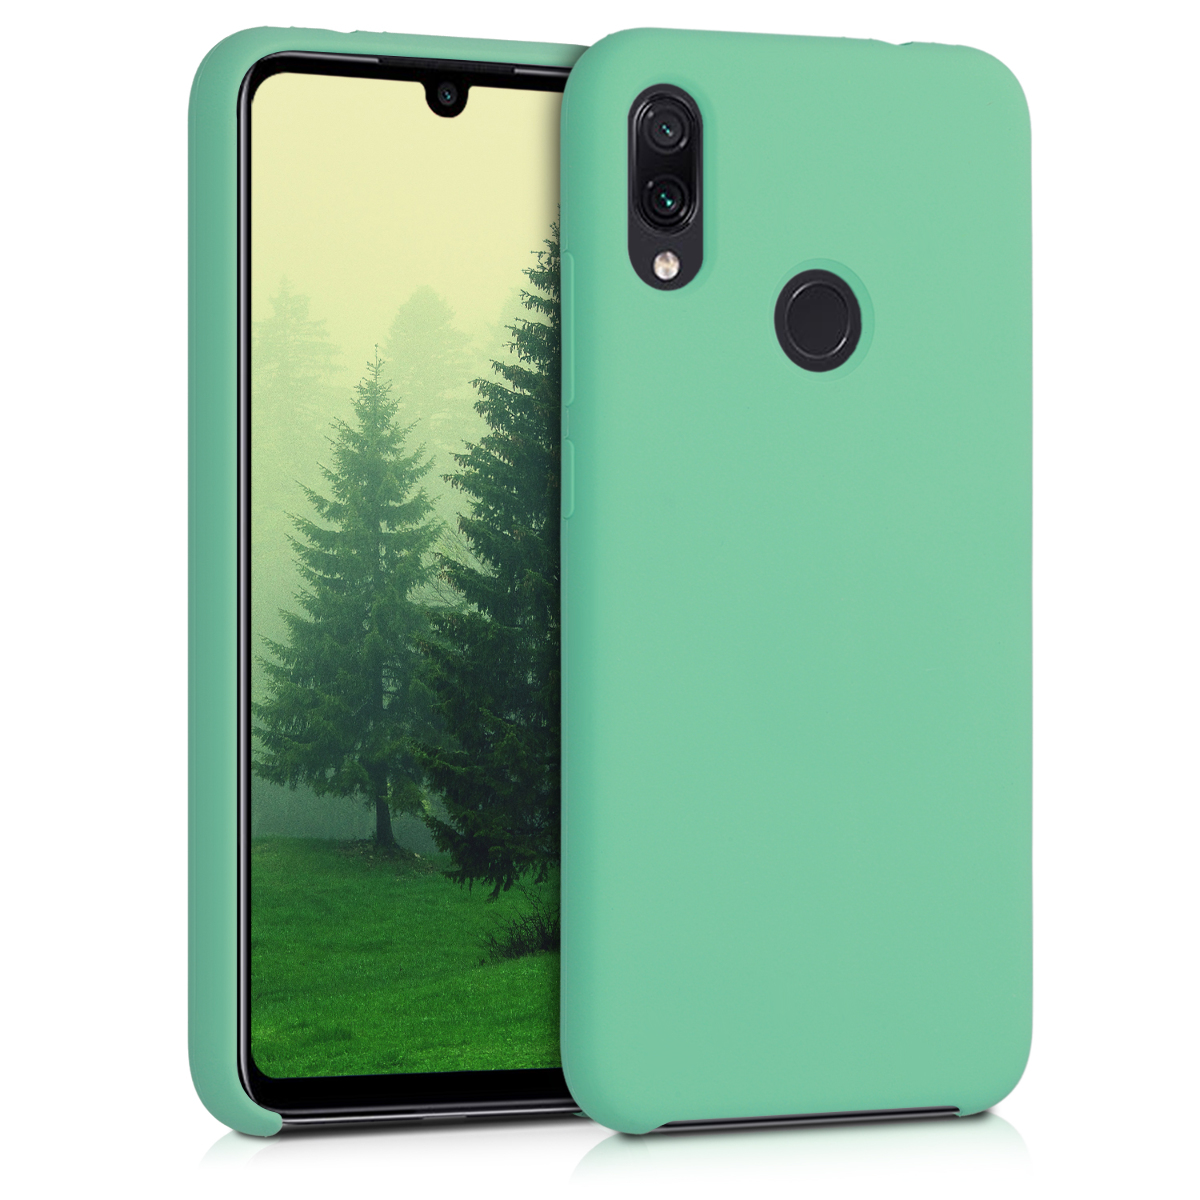 KW Θήκη Σιλικόνης Xiaomi Redmi Note 7 - Soft Flexible Rubber - Peppermint Green (48714.147)